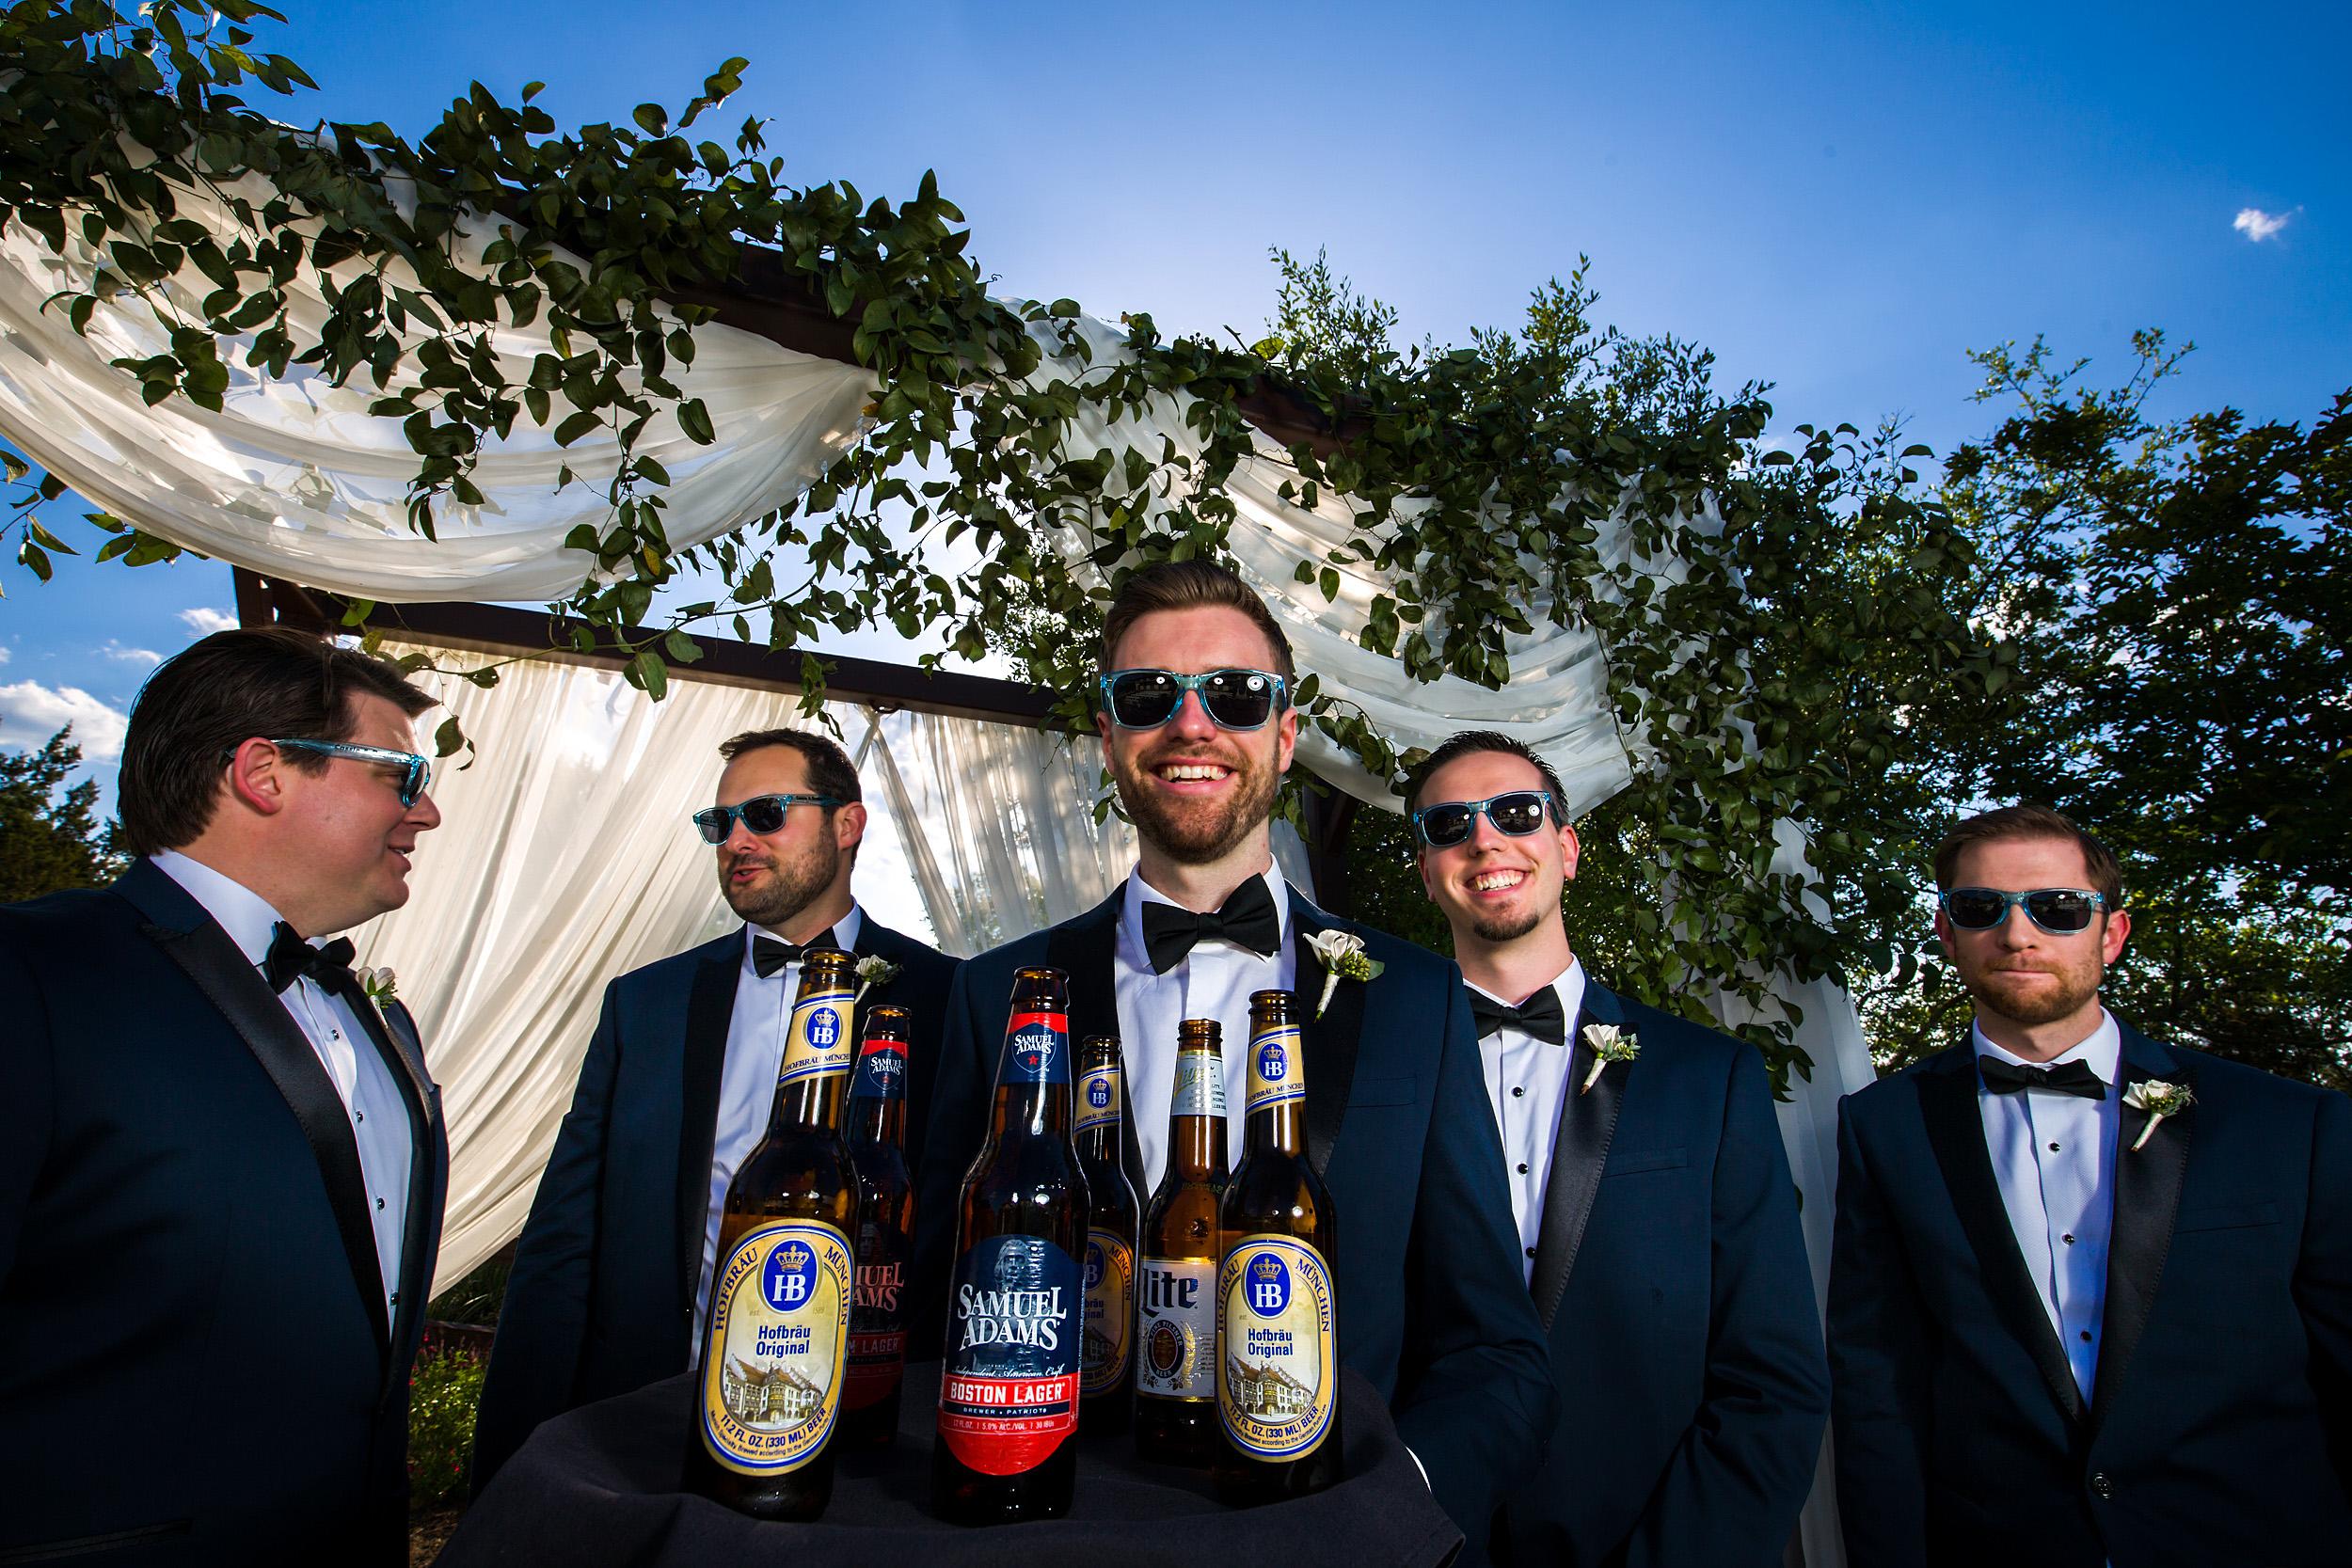 austin-wedding-mike-reed-32.jpg